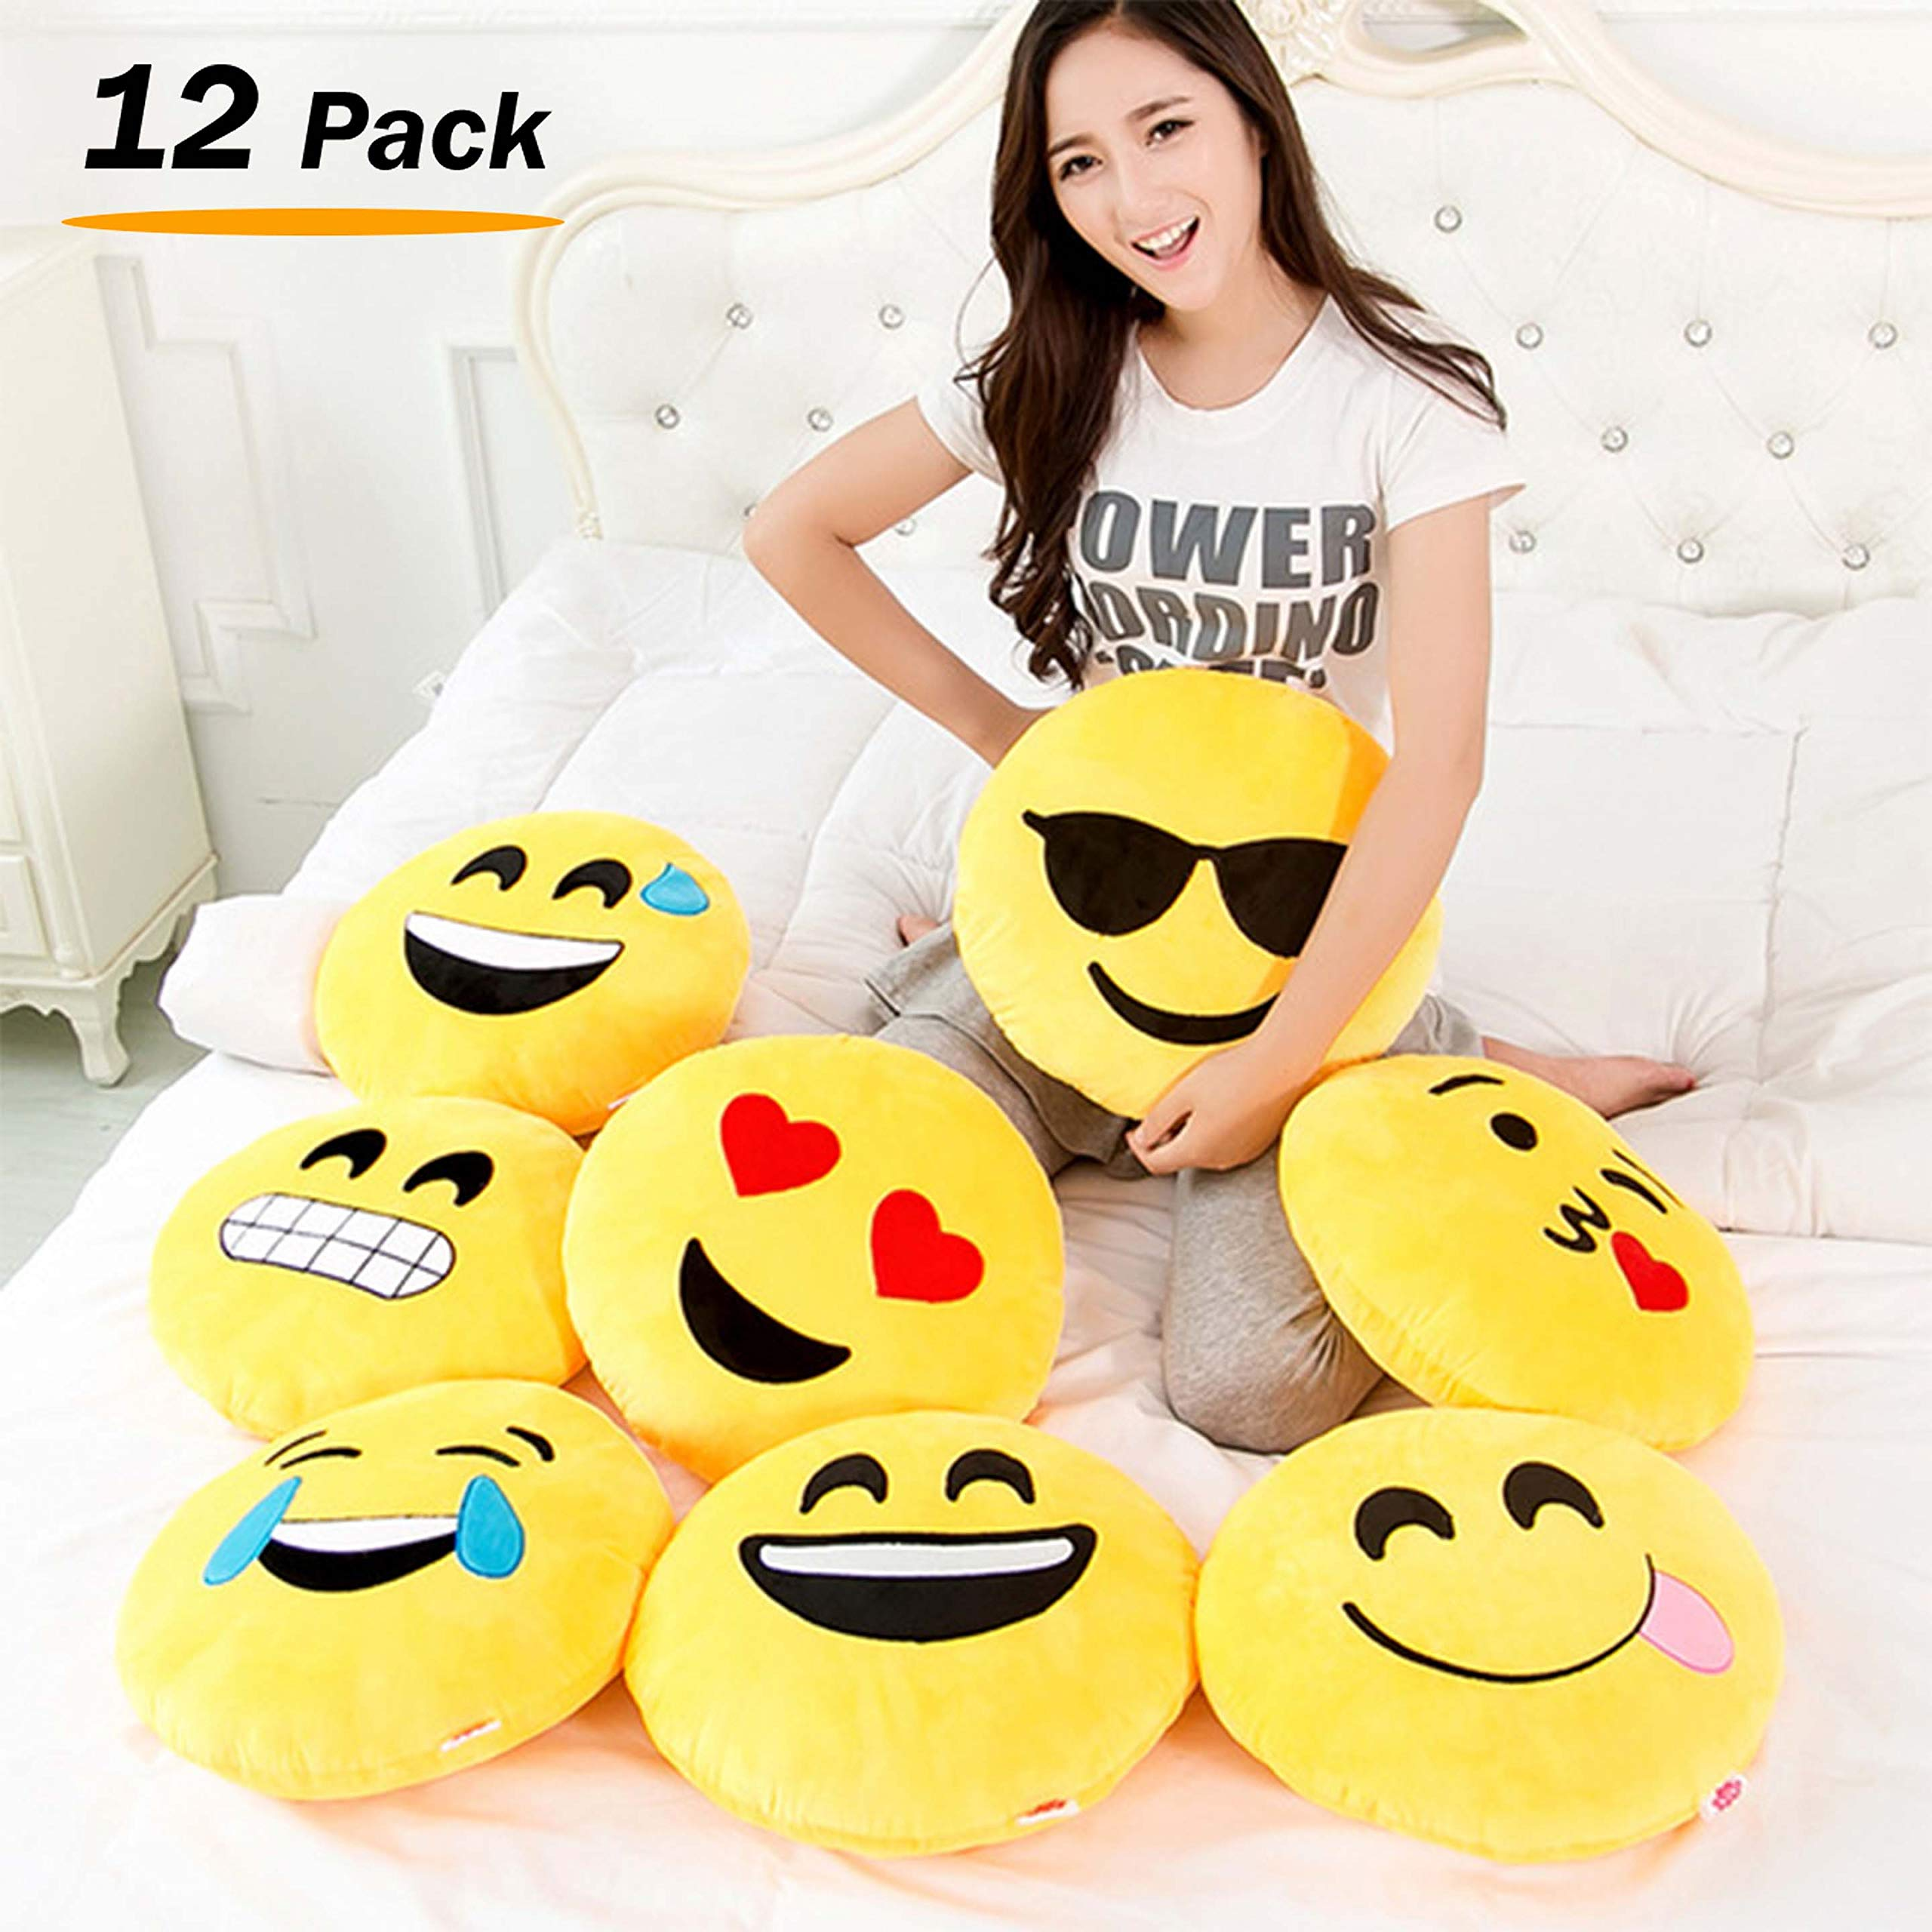 Liberty Imports [12 Pack] Large Emoji Plush Pillows, 13 Inches / 32CM Jumbo Stuffed Cushion Pillows Bulk Bundle Set (1 Dozen)